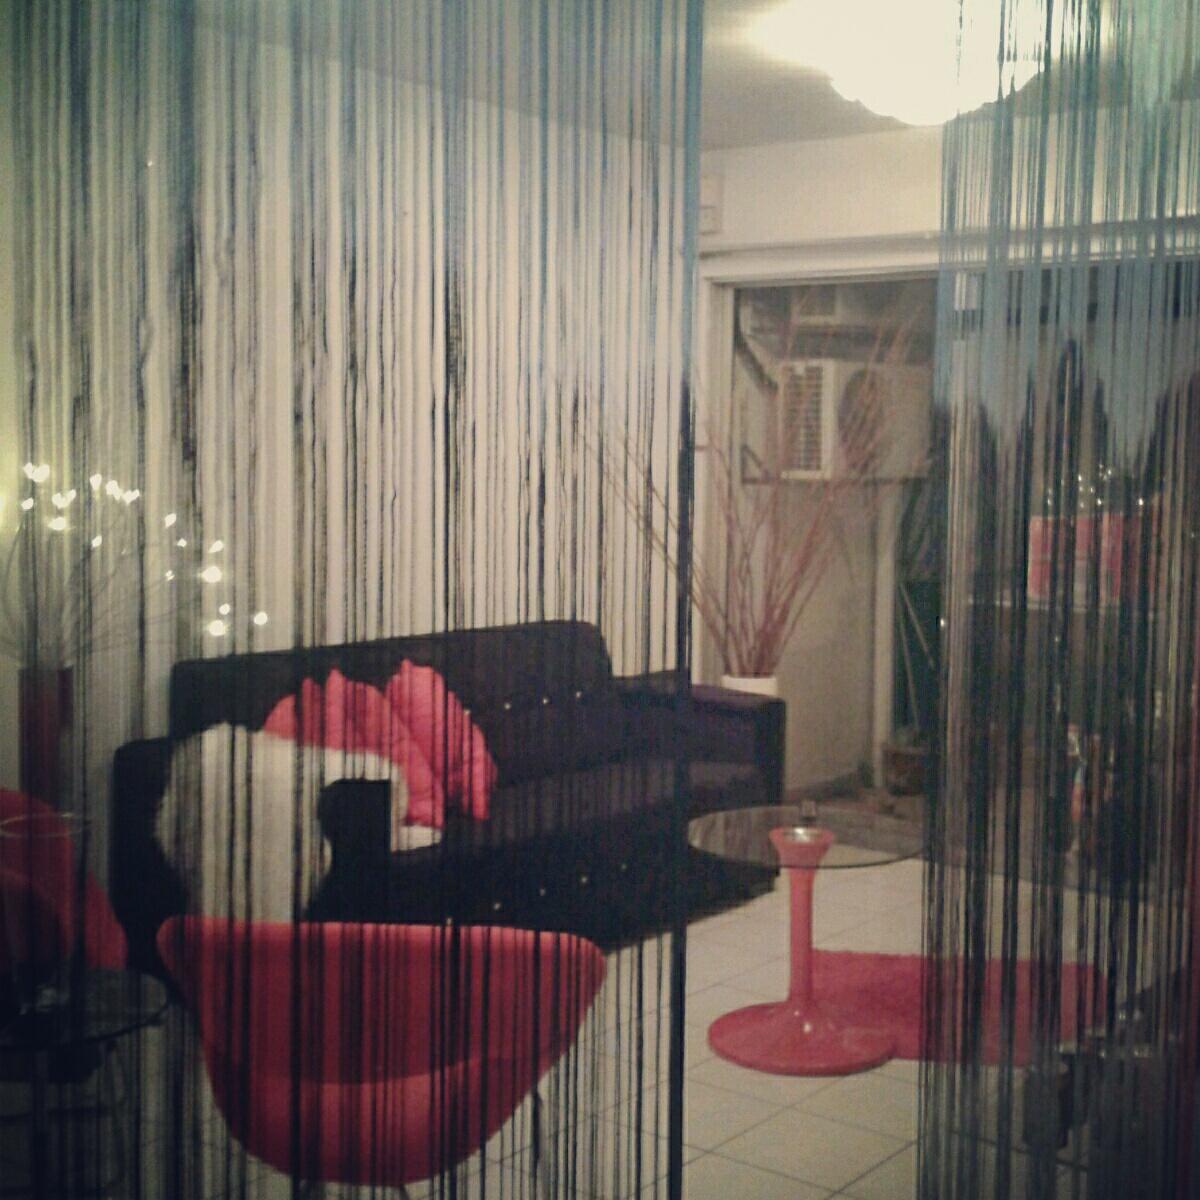 Dekorasi Rumah The Cranberries Crib Blog Lateyes By Innanie